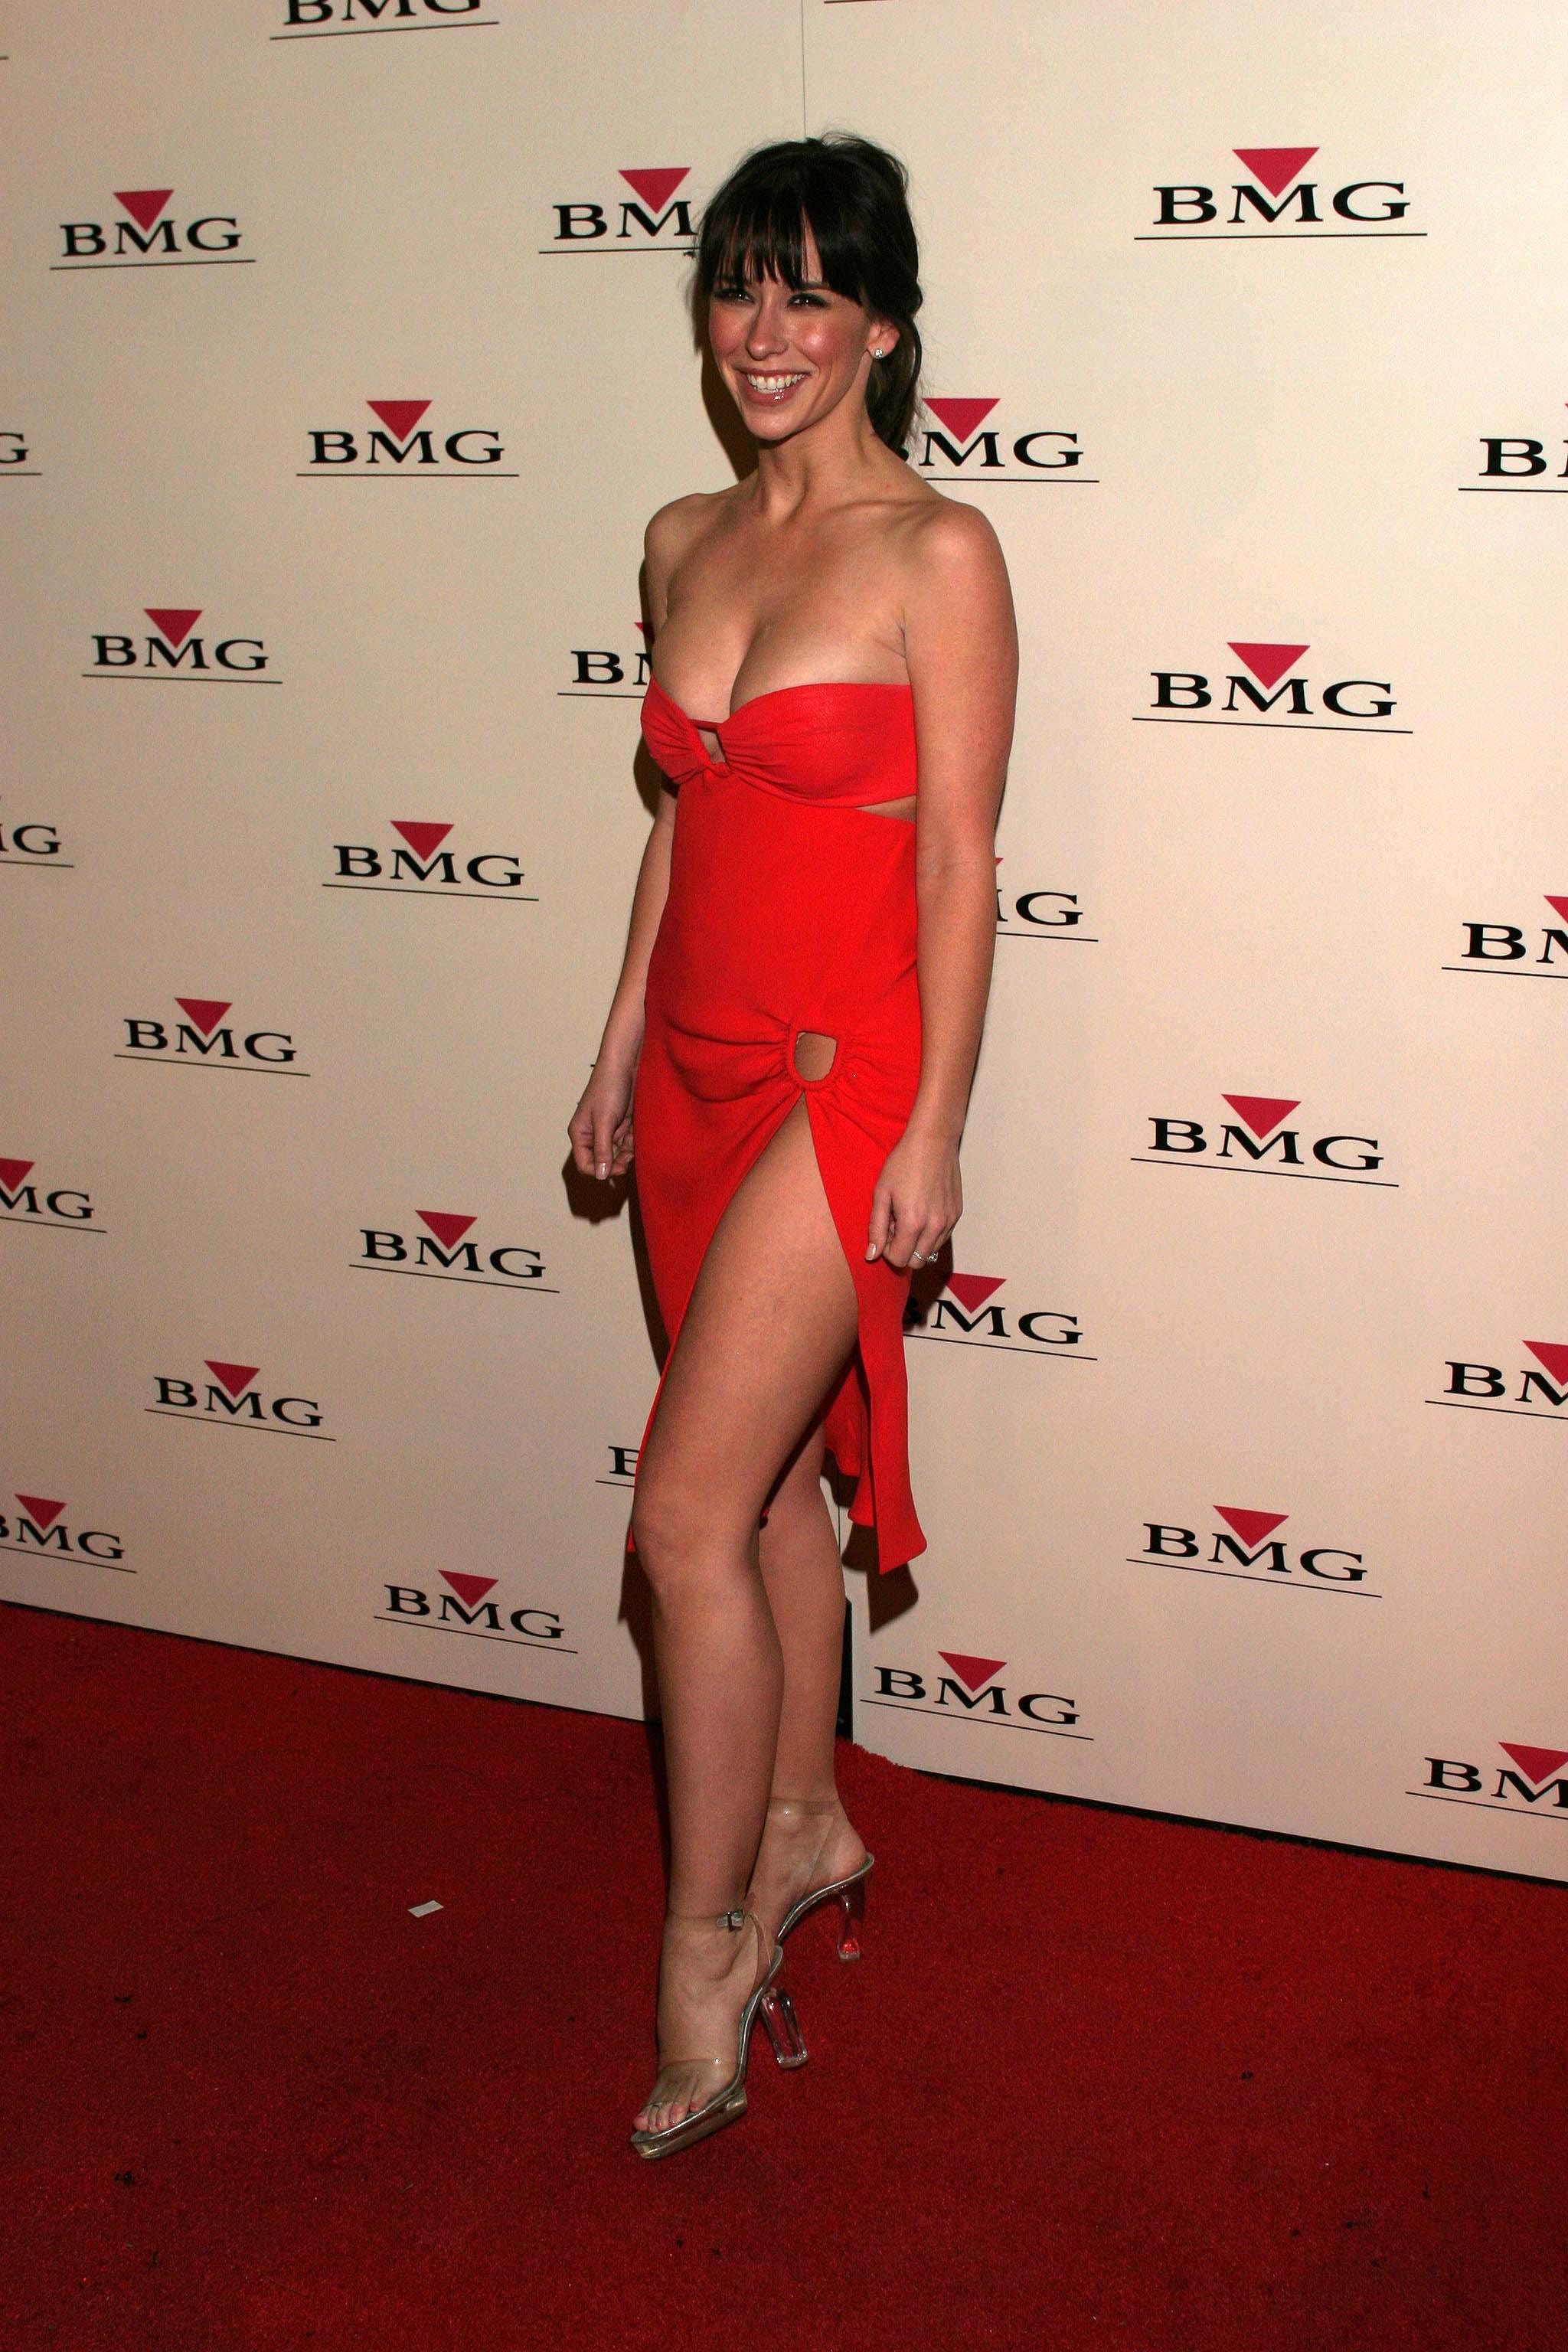 Jennifer Love Hewitt photo 1212 of 1476 pics, wallpaper - photo #548554 -  ThePlace2